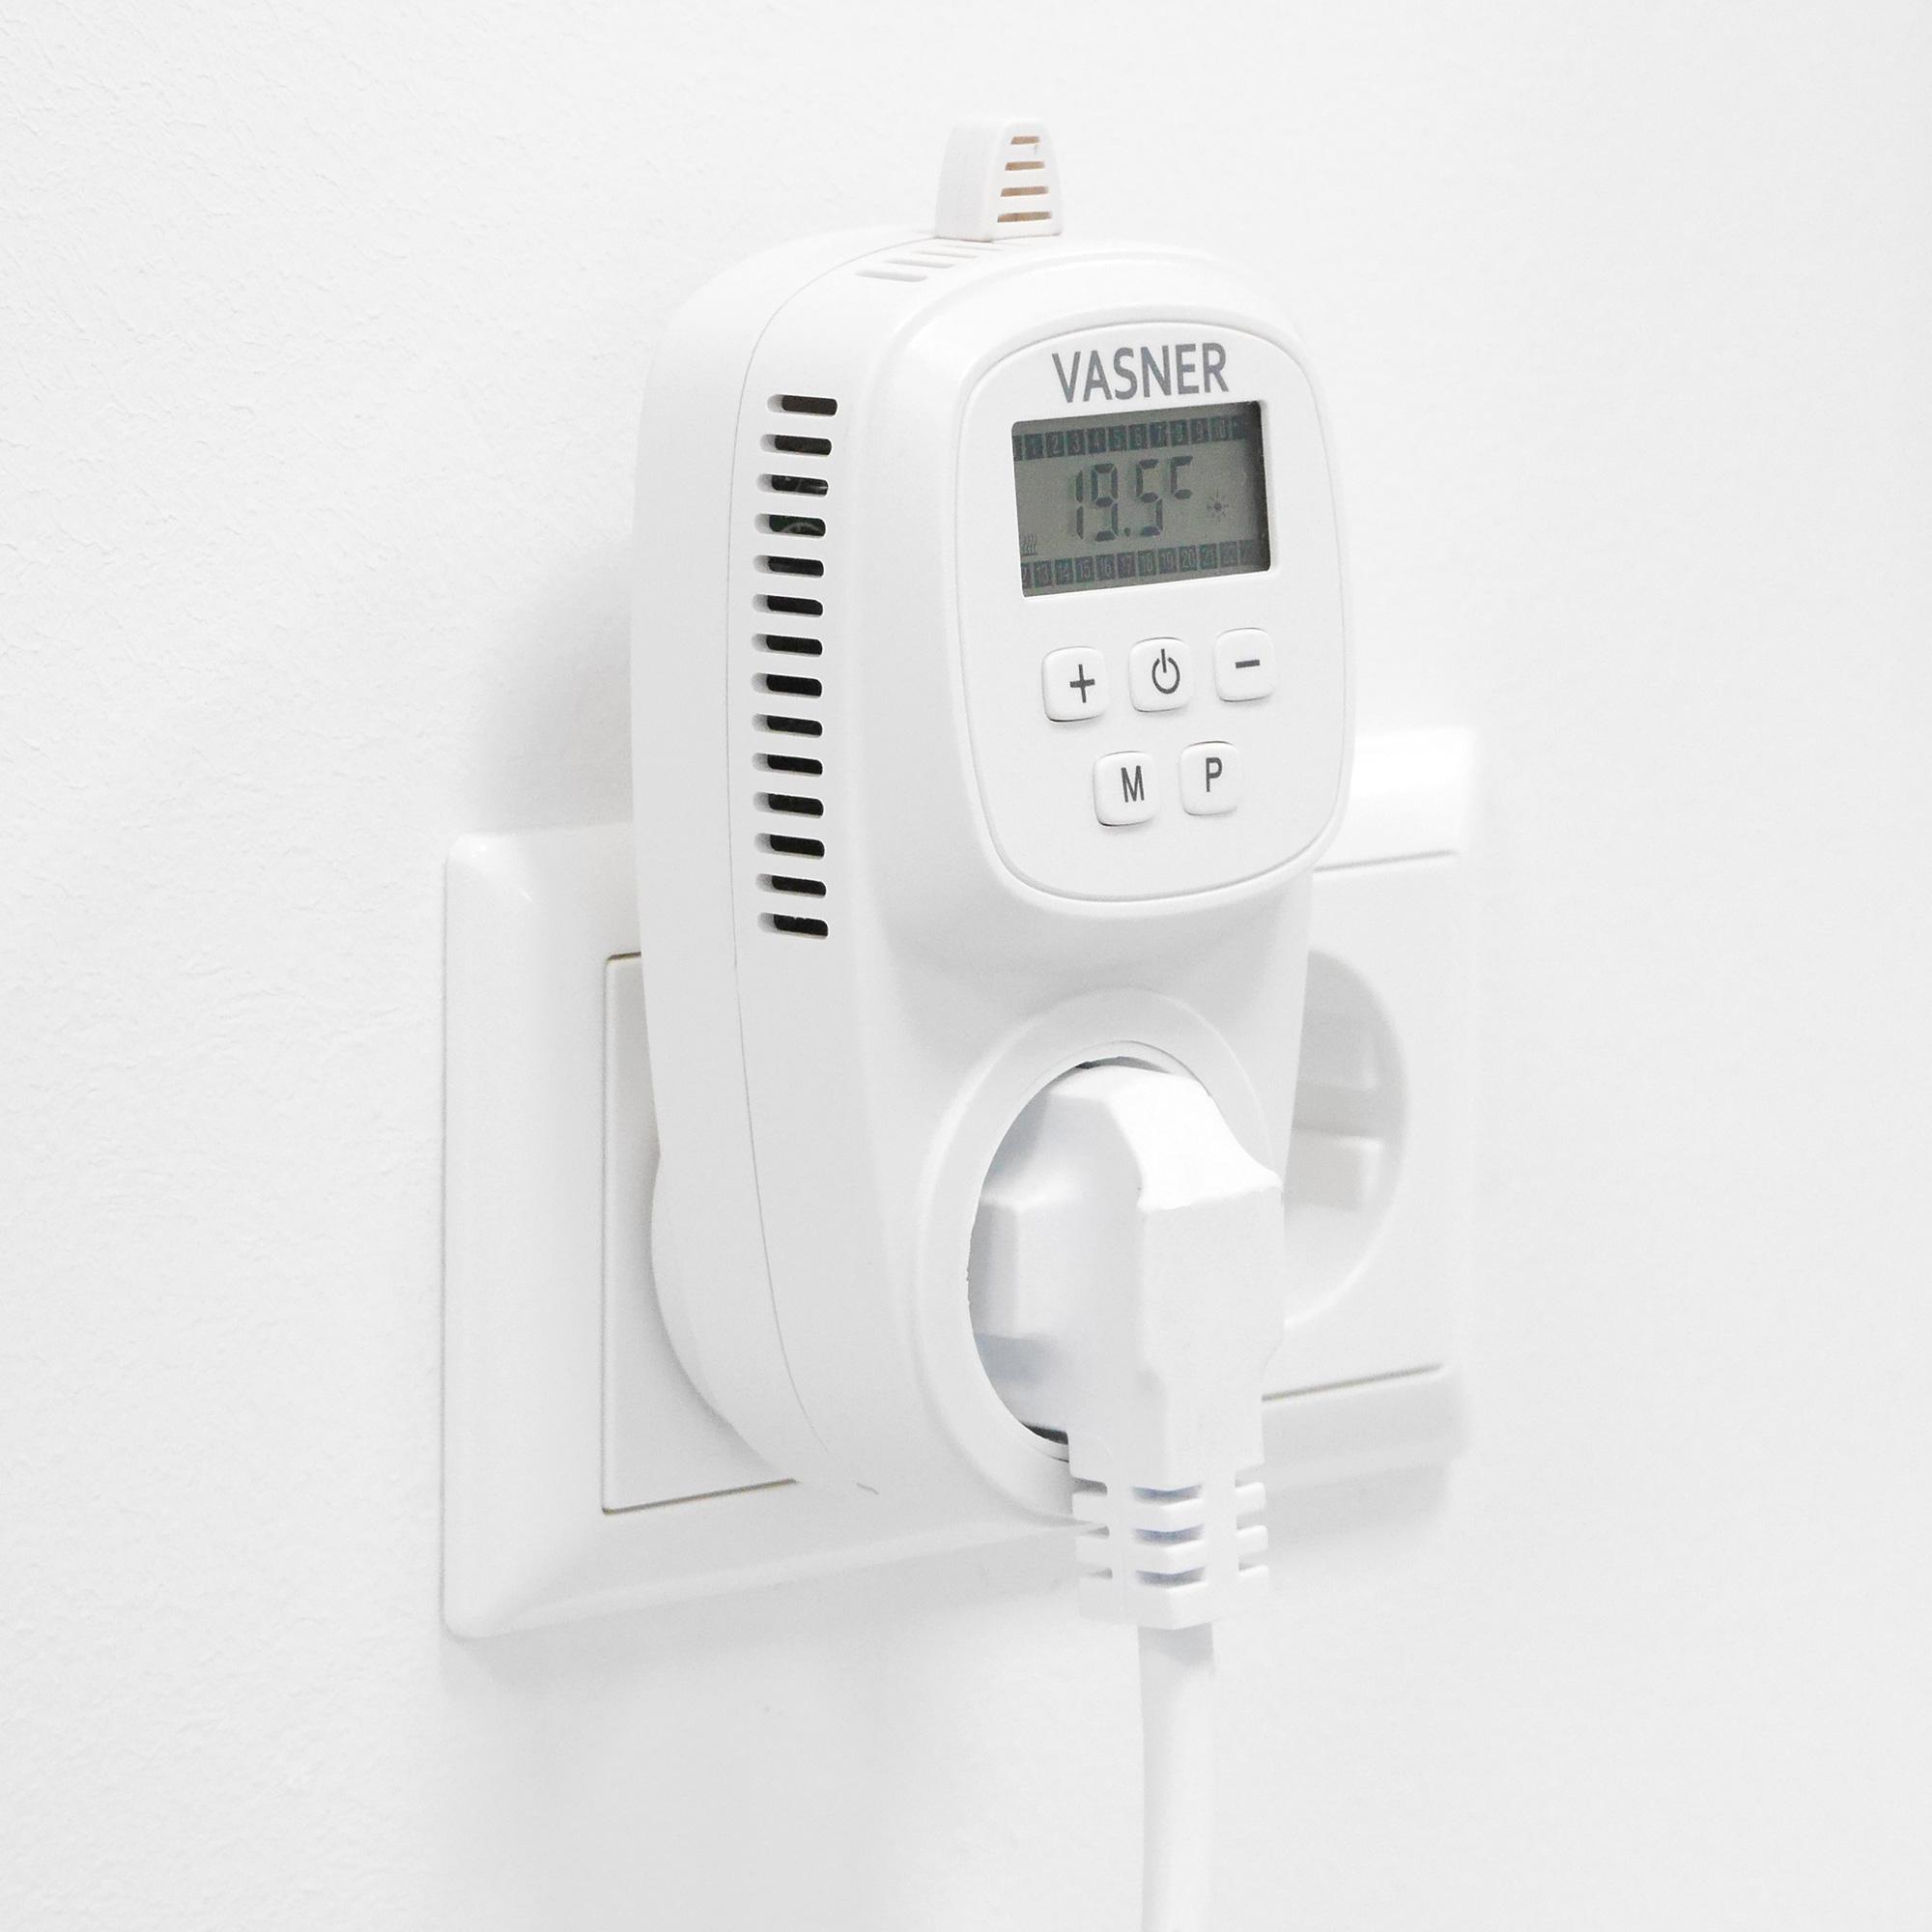 vasner universal thermostat vut35 infrarotheizung elektroheizung. Black Bedroom Furniture Sets. Home Design Ideas